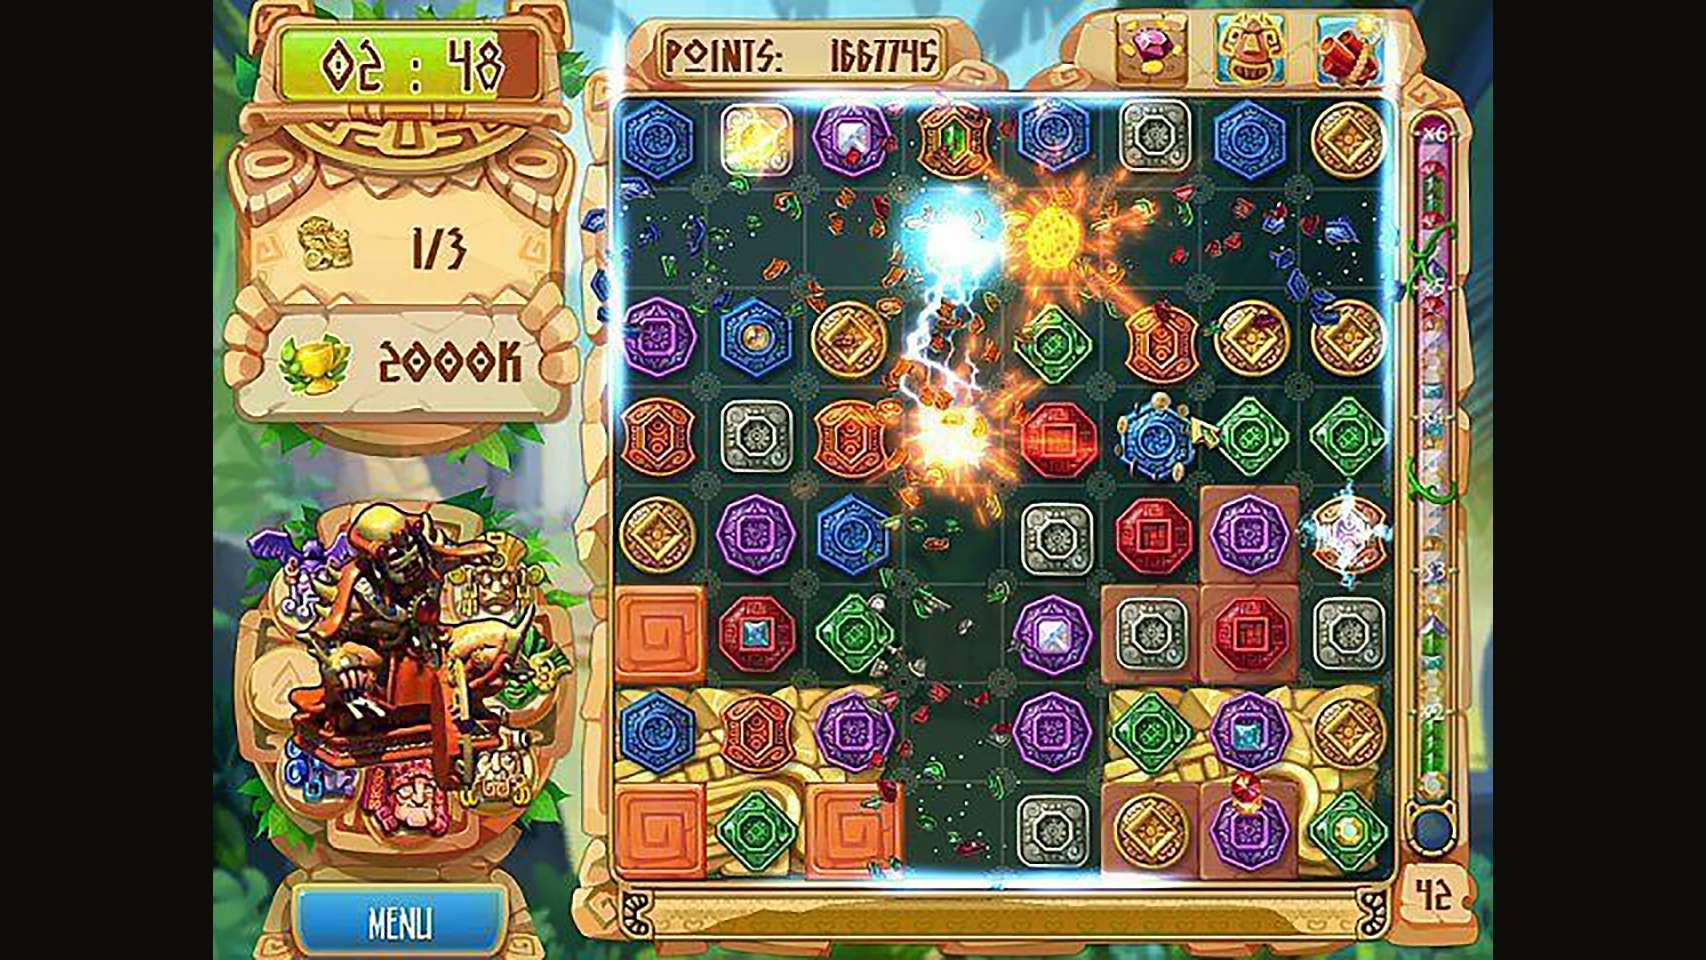 Screenshot from The Treasures of Montezuma 5 (3/7)